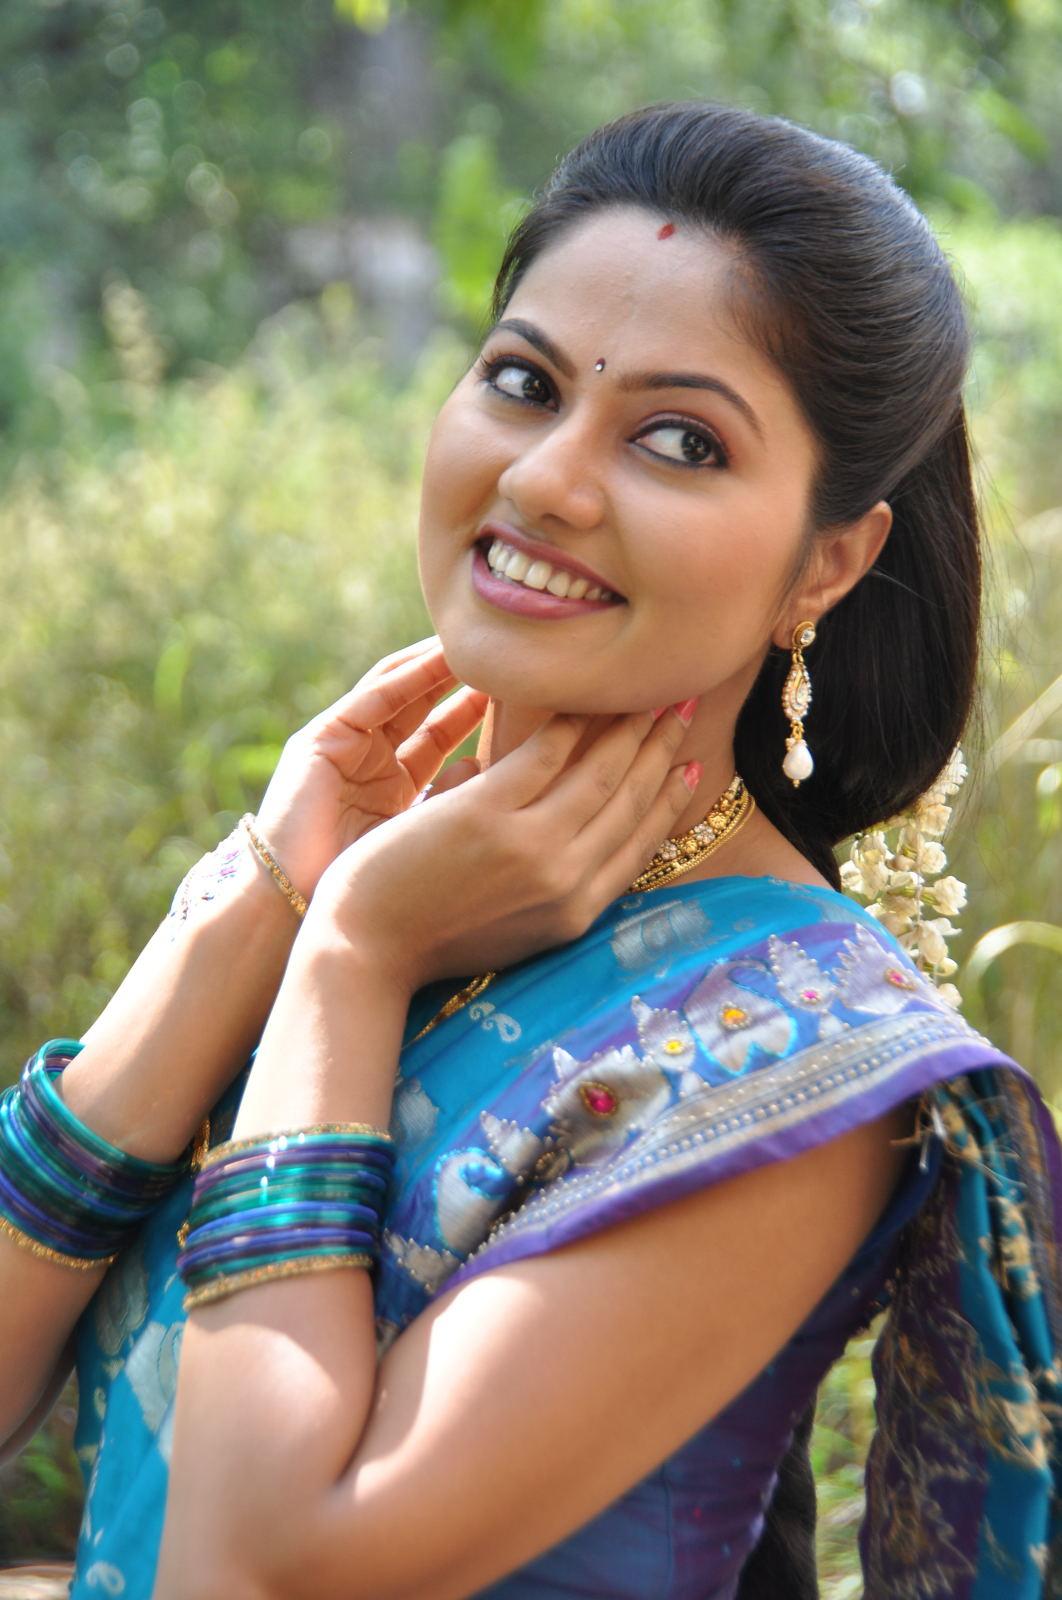 Agree, Suhasini Tamil Actress Nude-6639